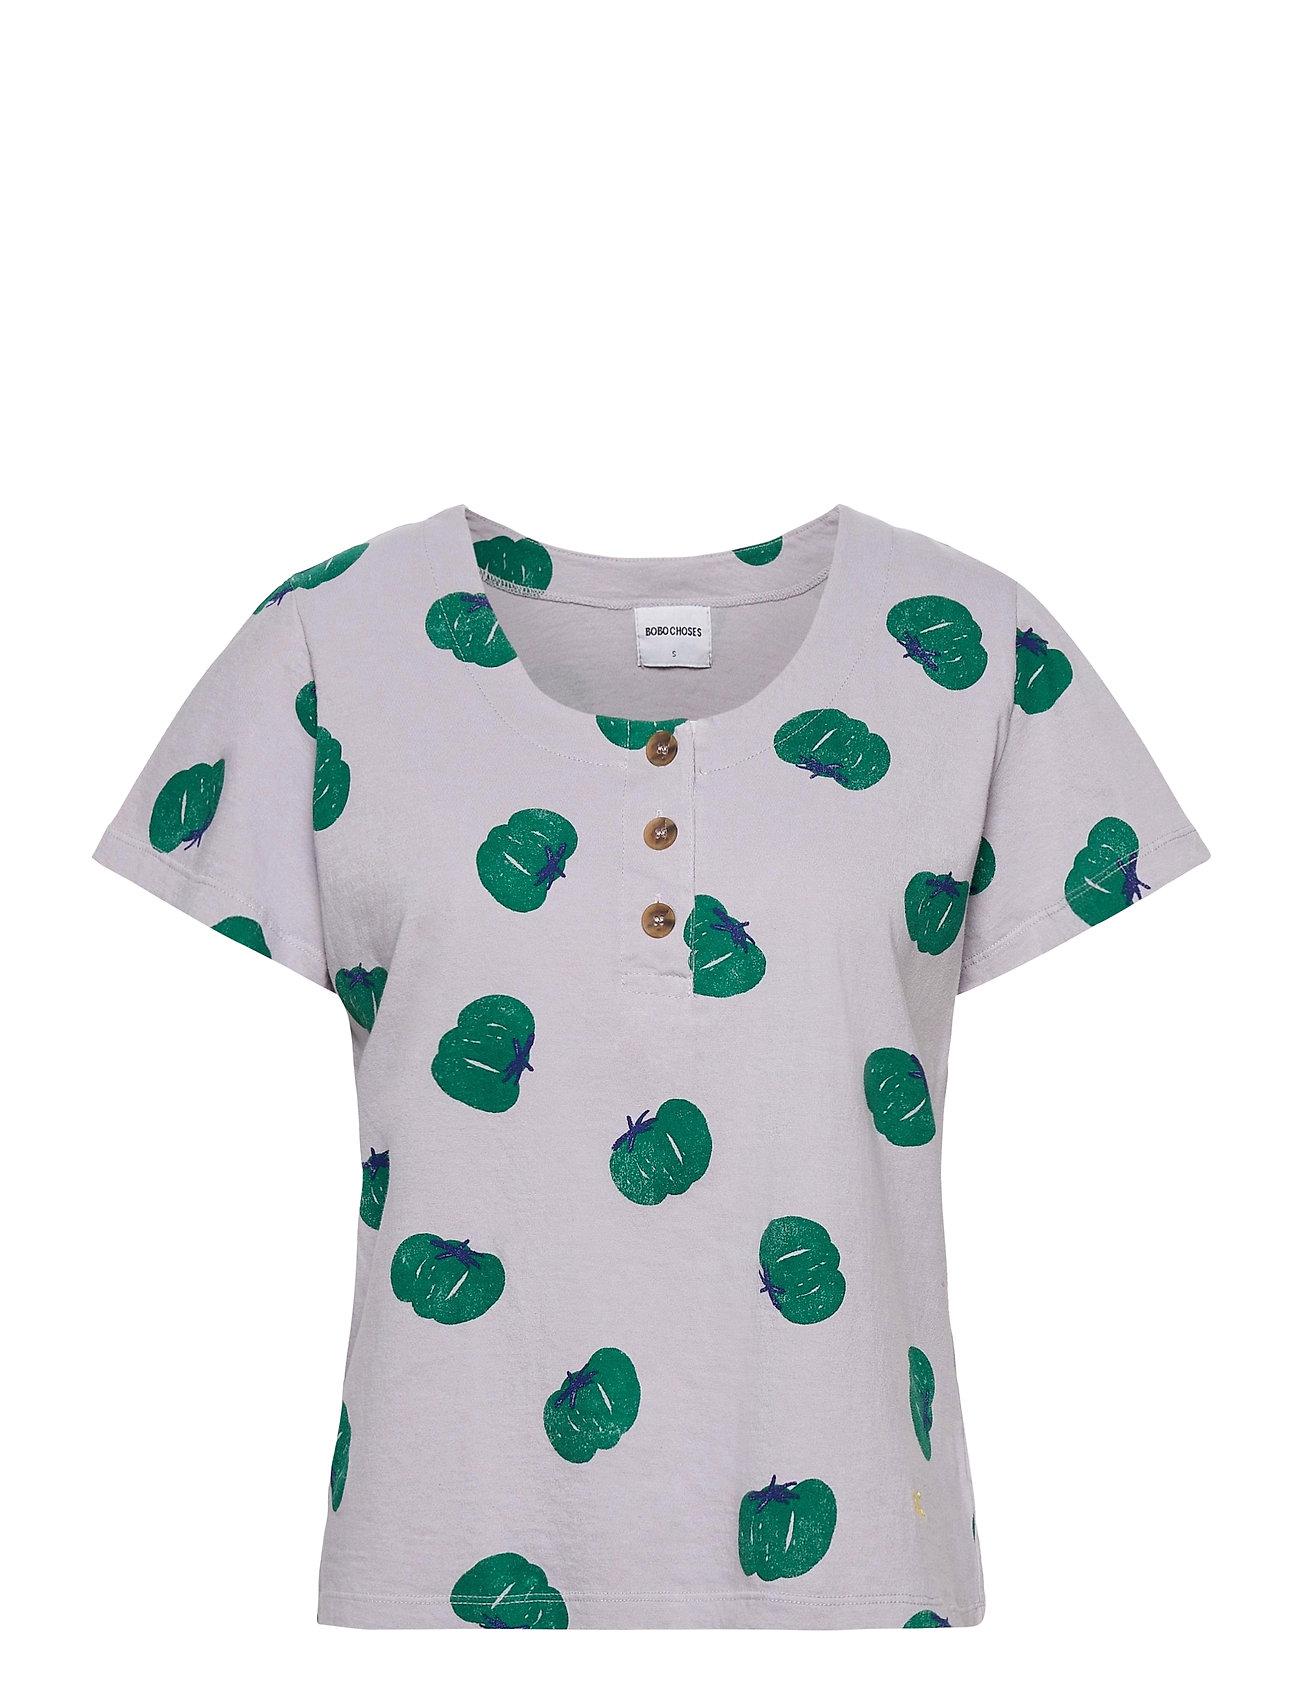 Image of Tomatoes Butt D T-Shirt T-shirt Top Multi/mønstret Bobo Choses (3493876213)